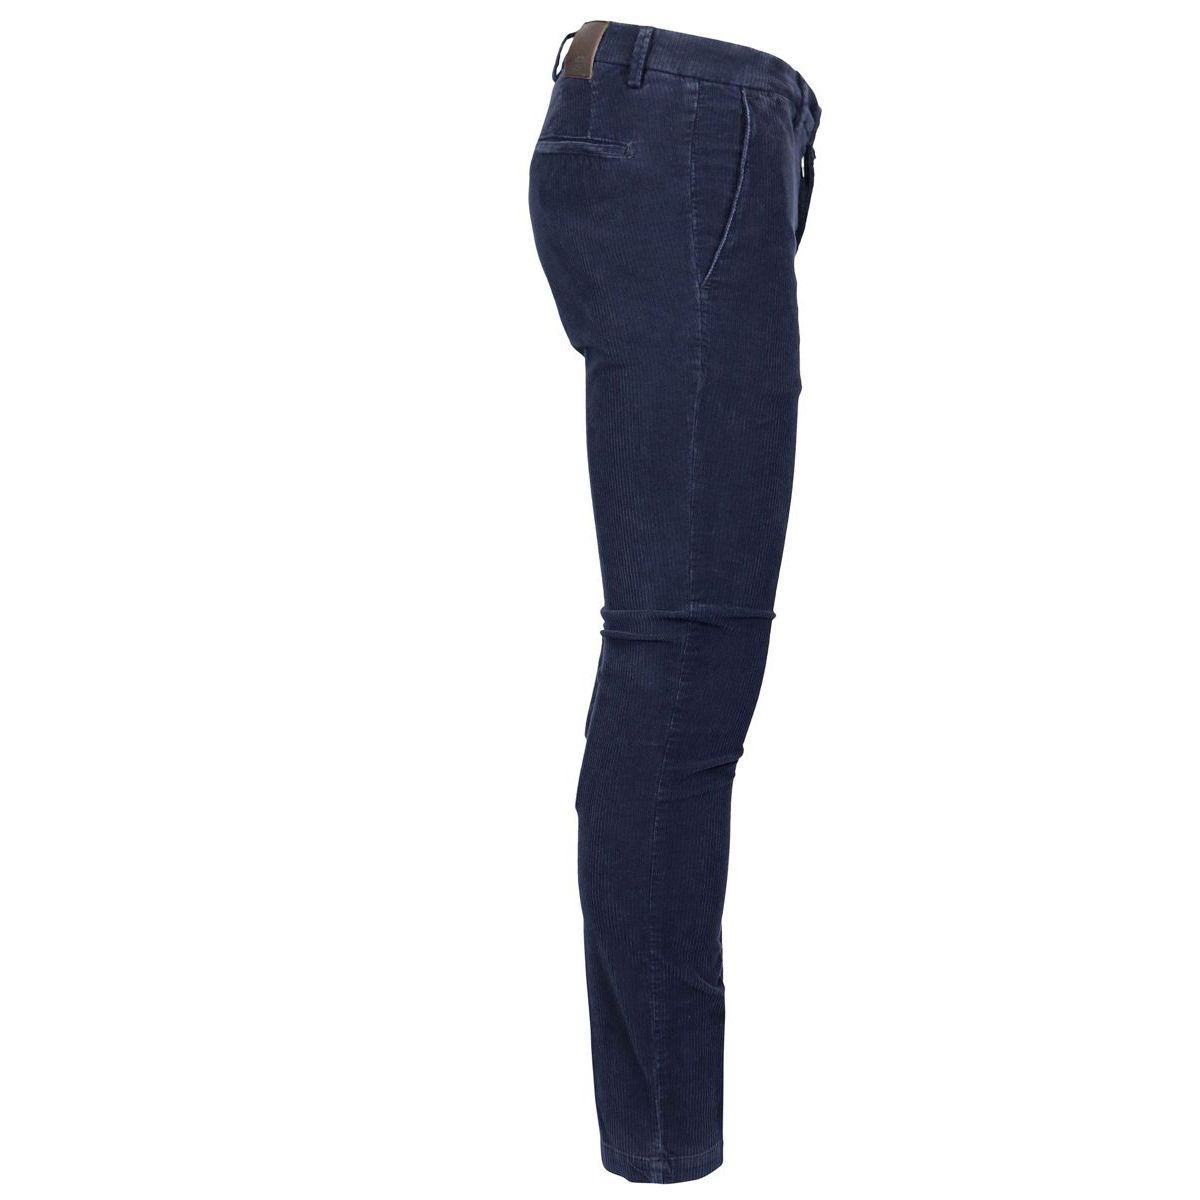 America pocket slim corduroy trousers Navy Briglia